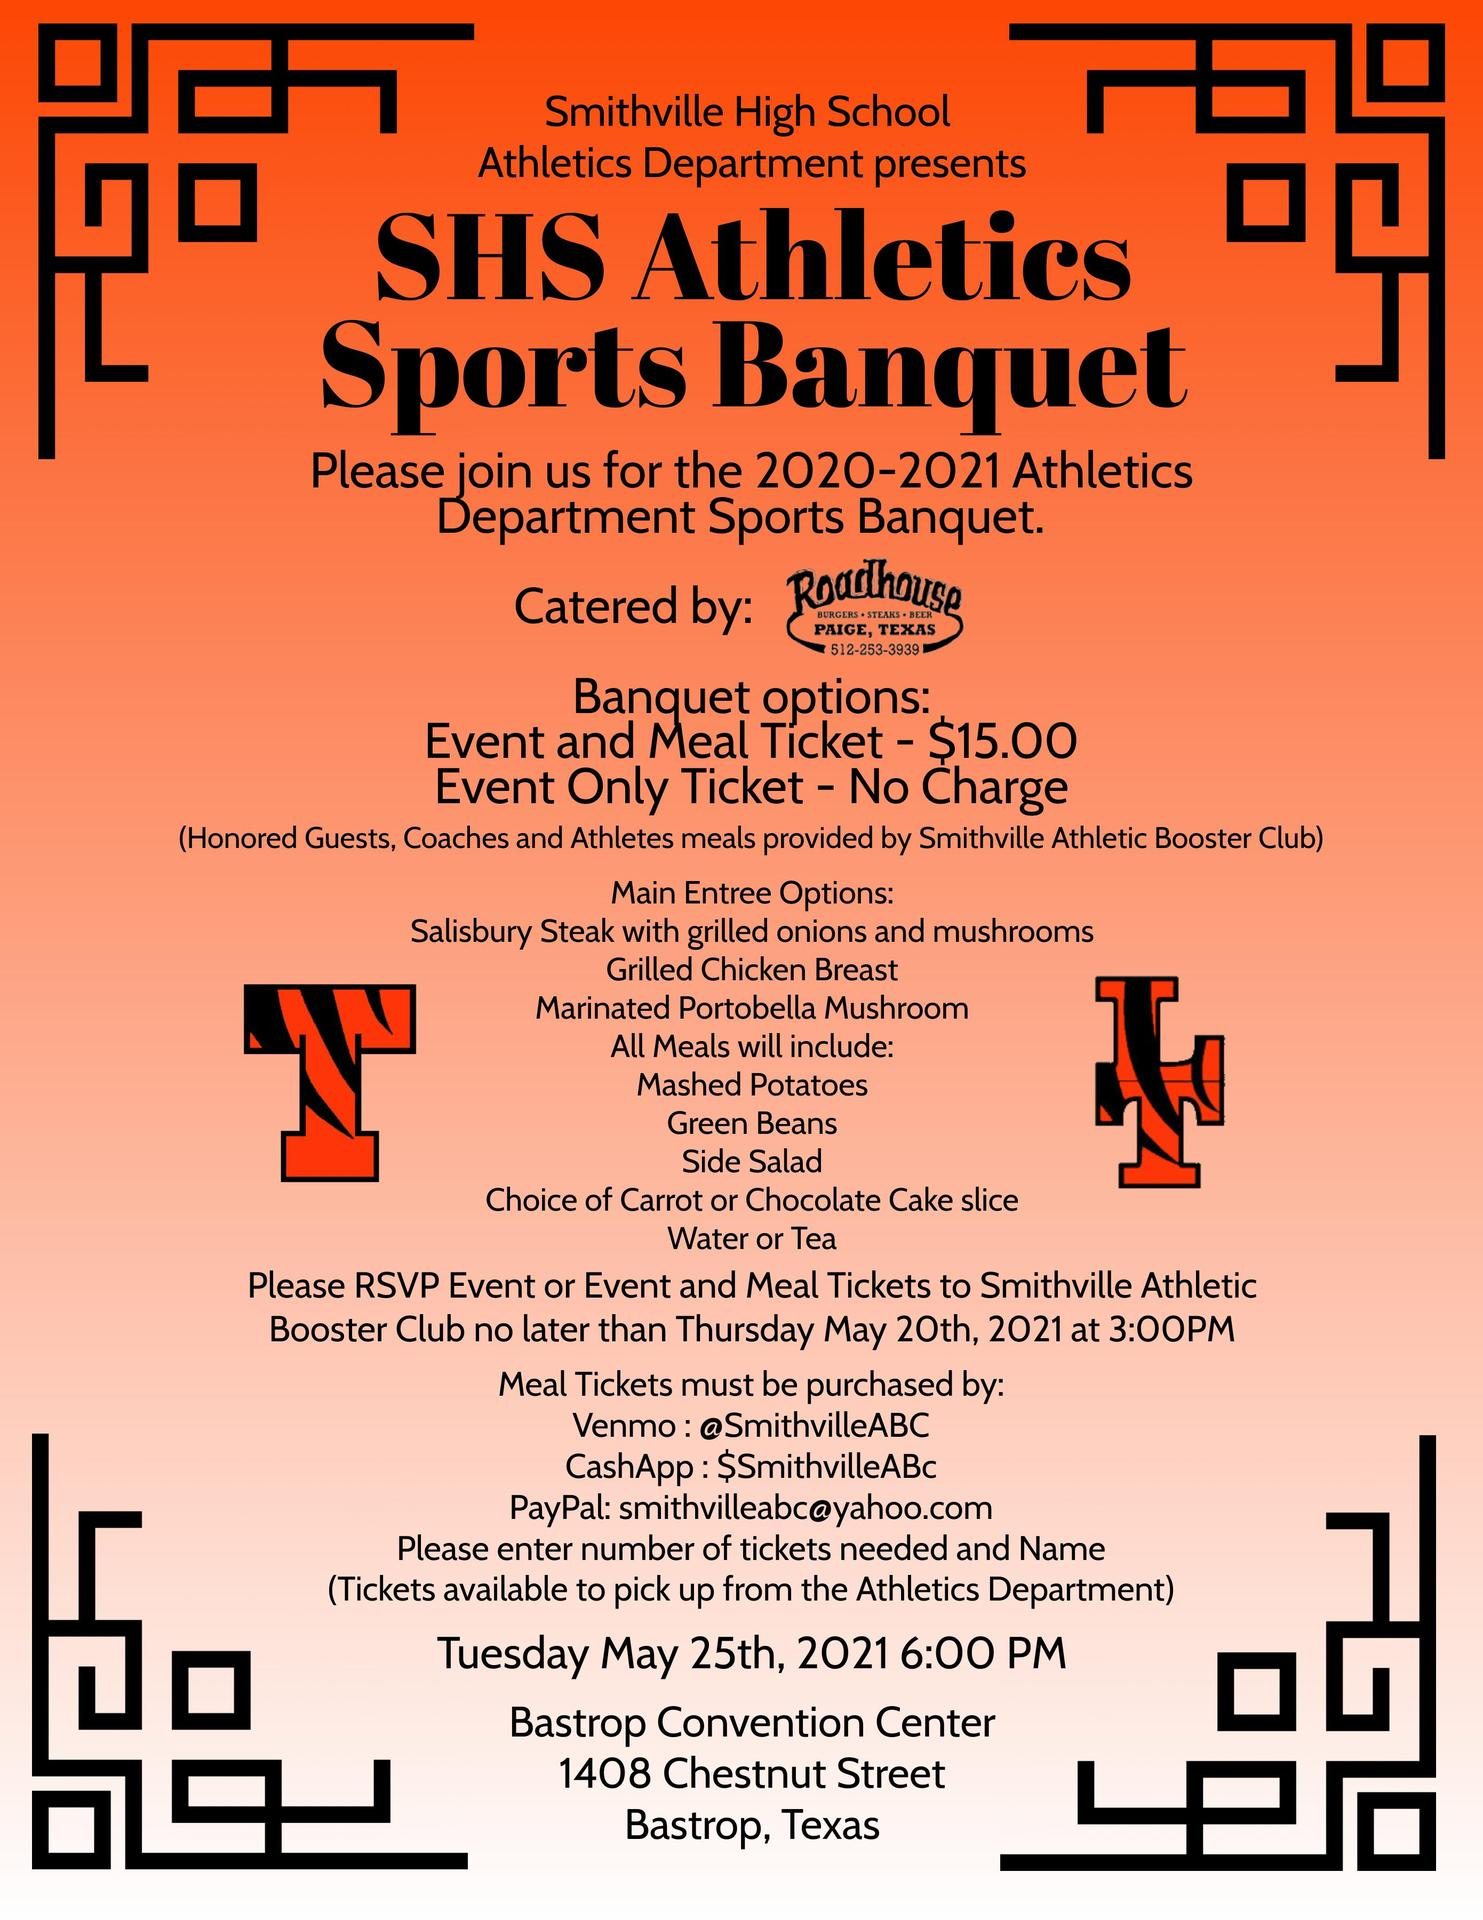 20-21 Sports Banquet